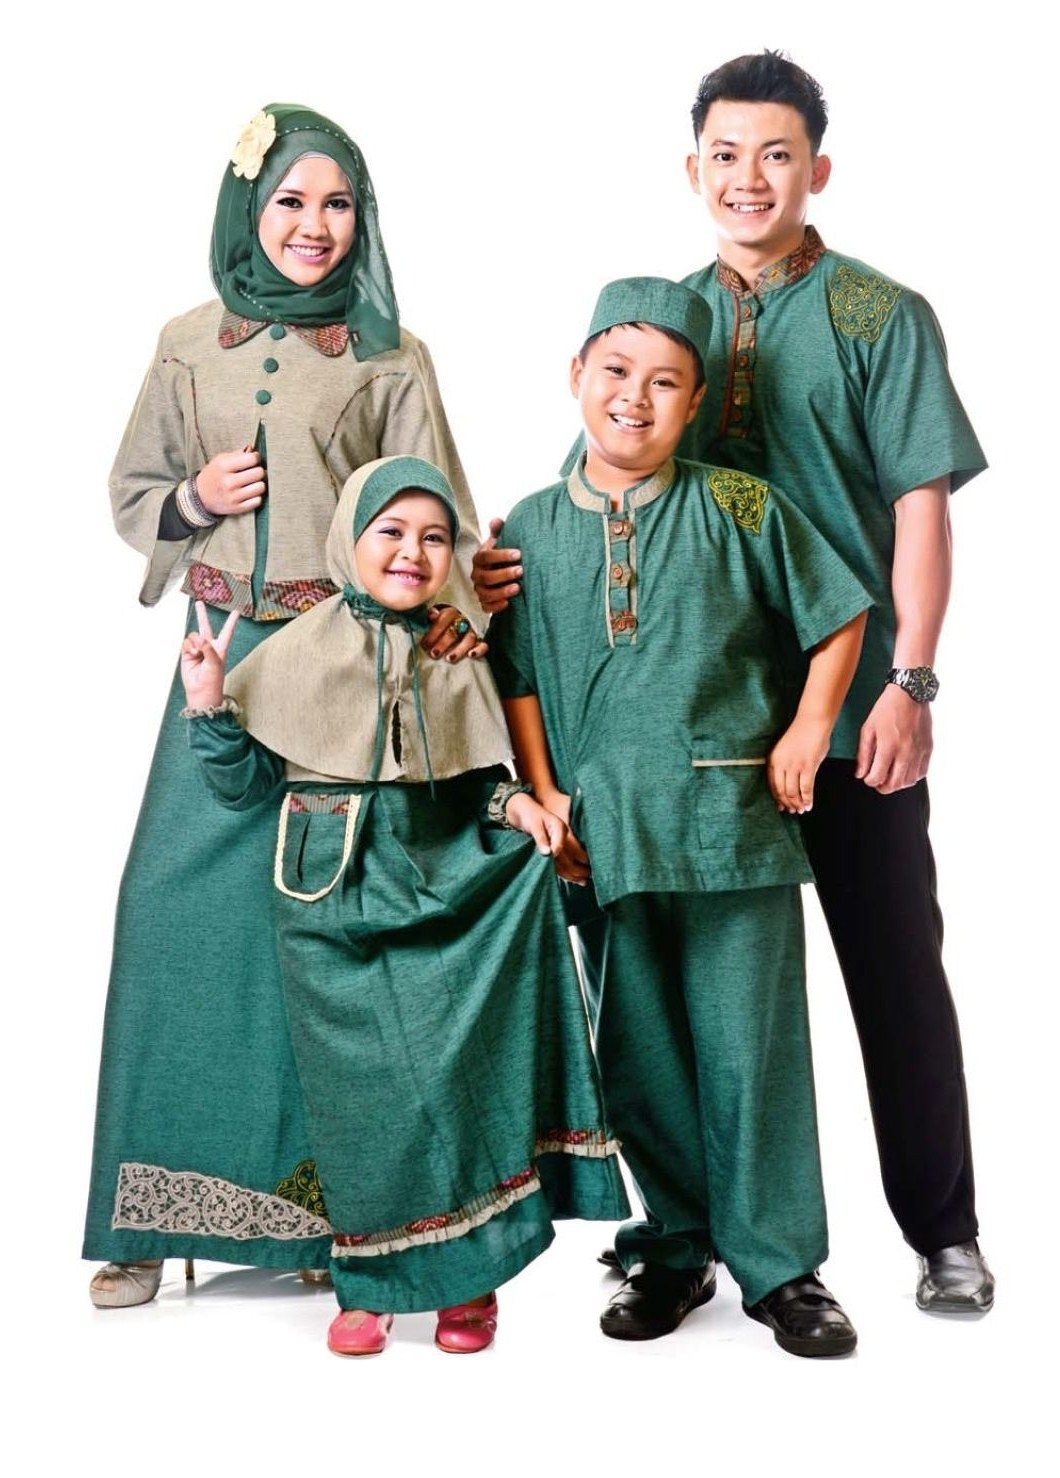 Inspirasi Model Baju Lebaran 2019 Untuk Keluarga Mndw 40 Baju Seragam Keluarga Lebaran 2020 Inspirasi Terbaru